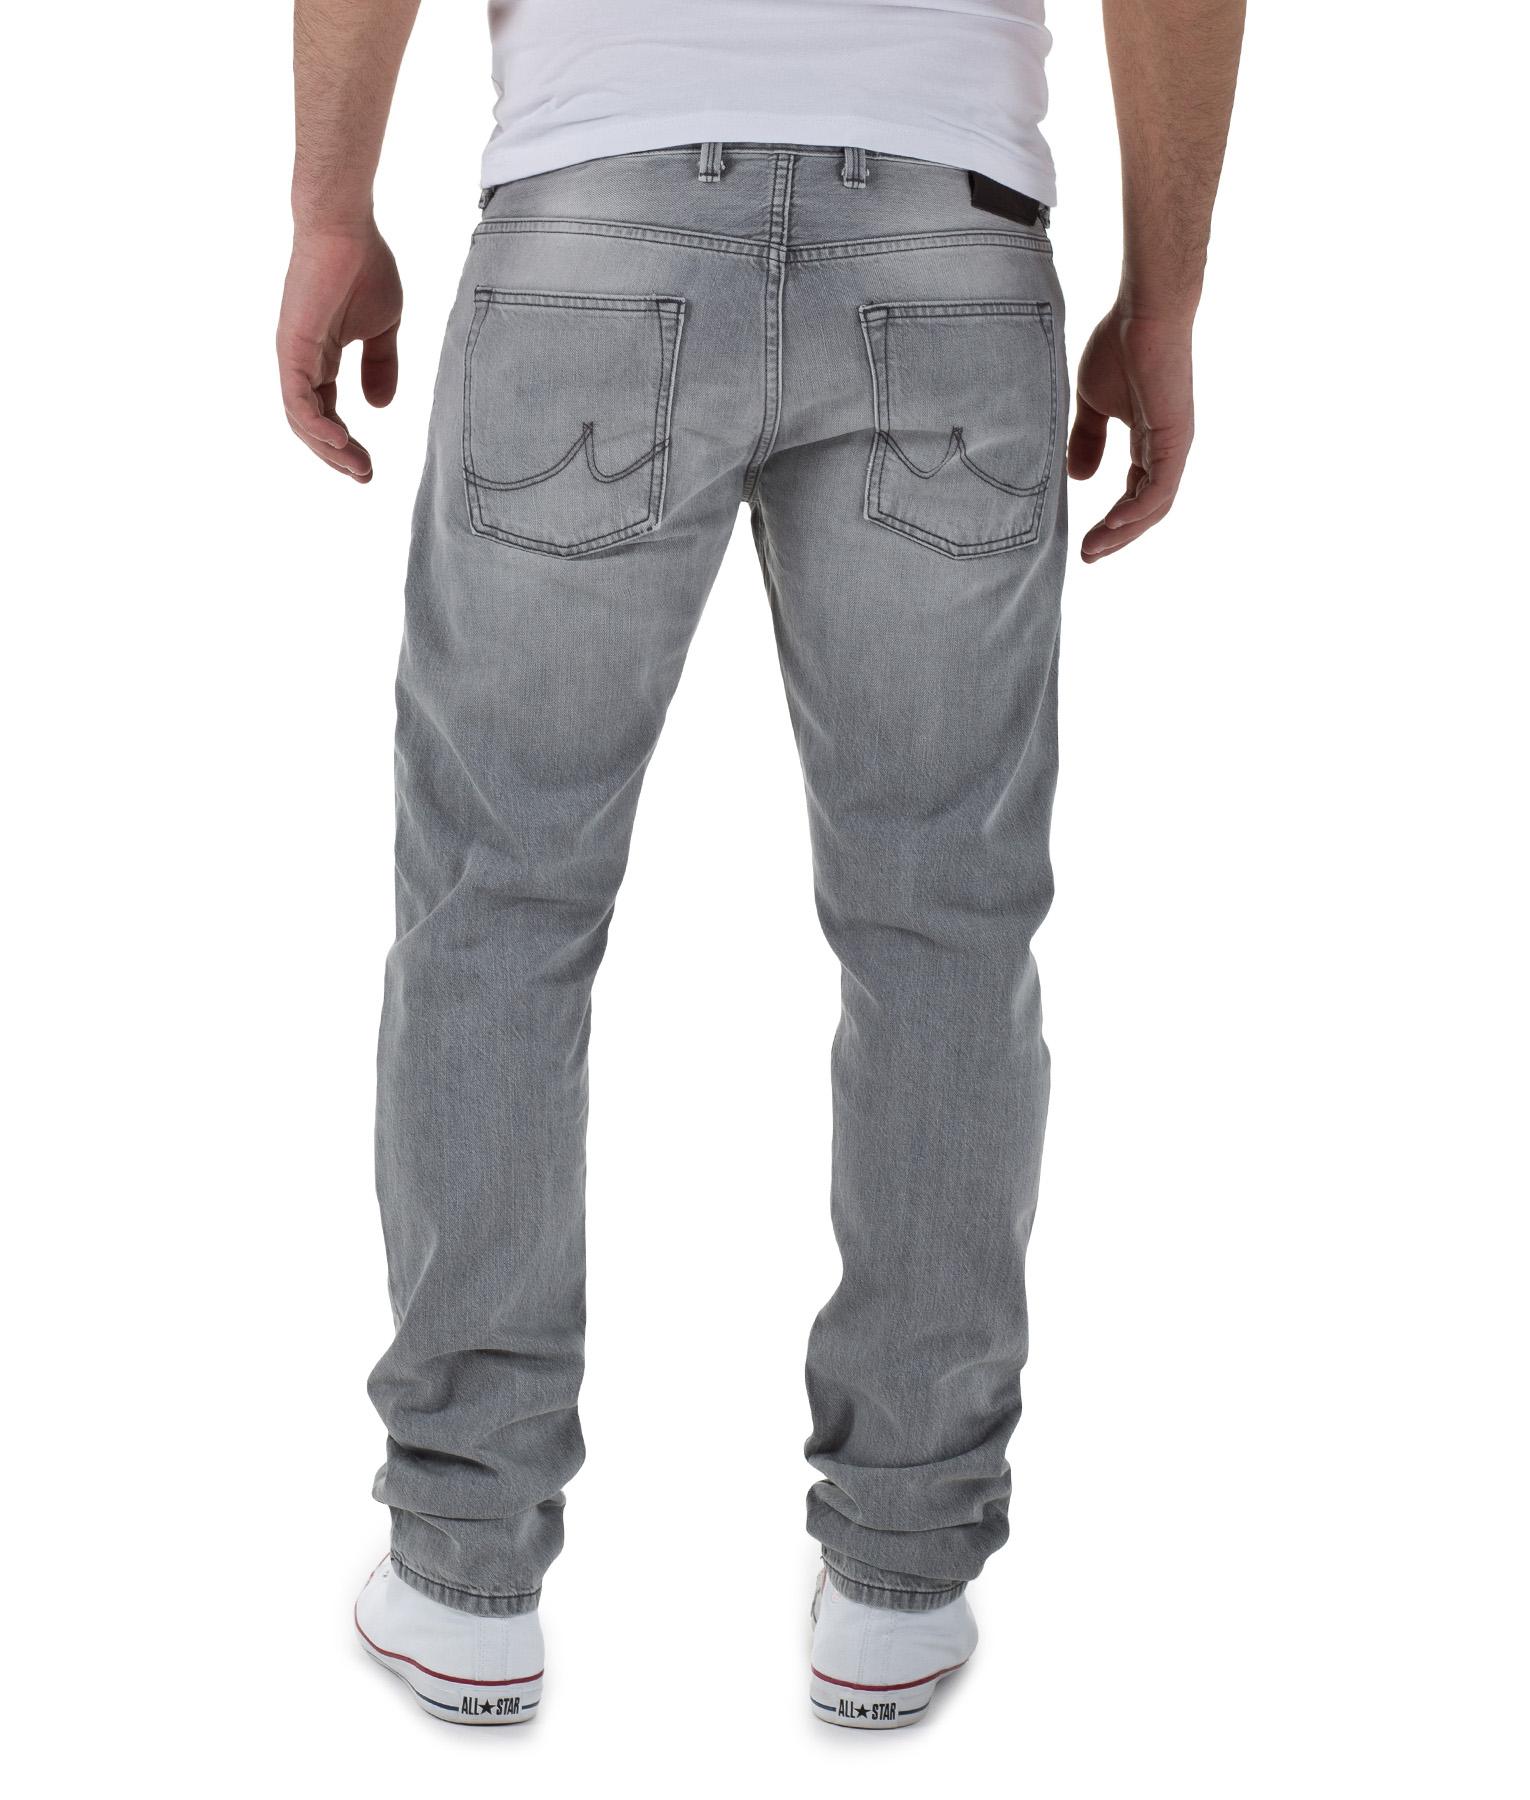 Graue jeans hose herren